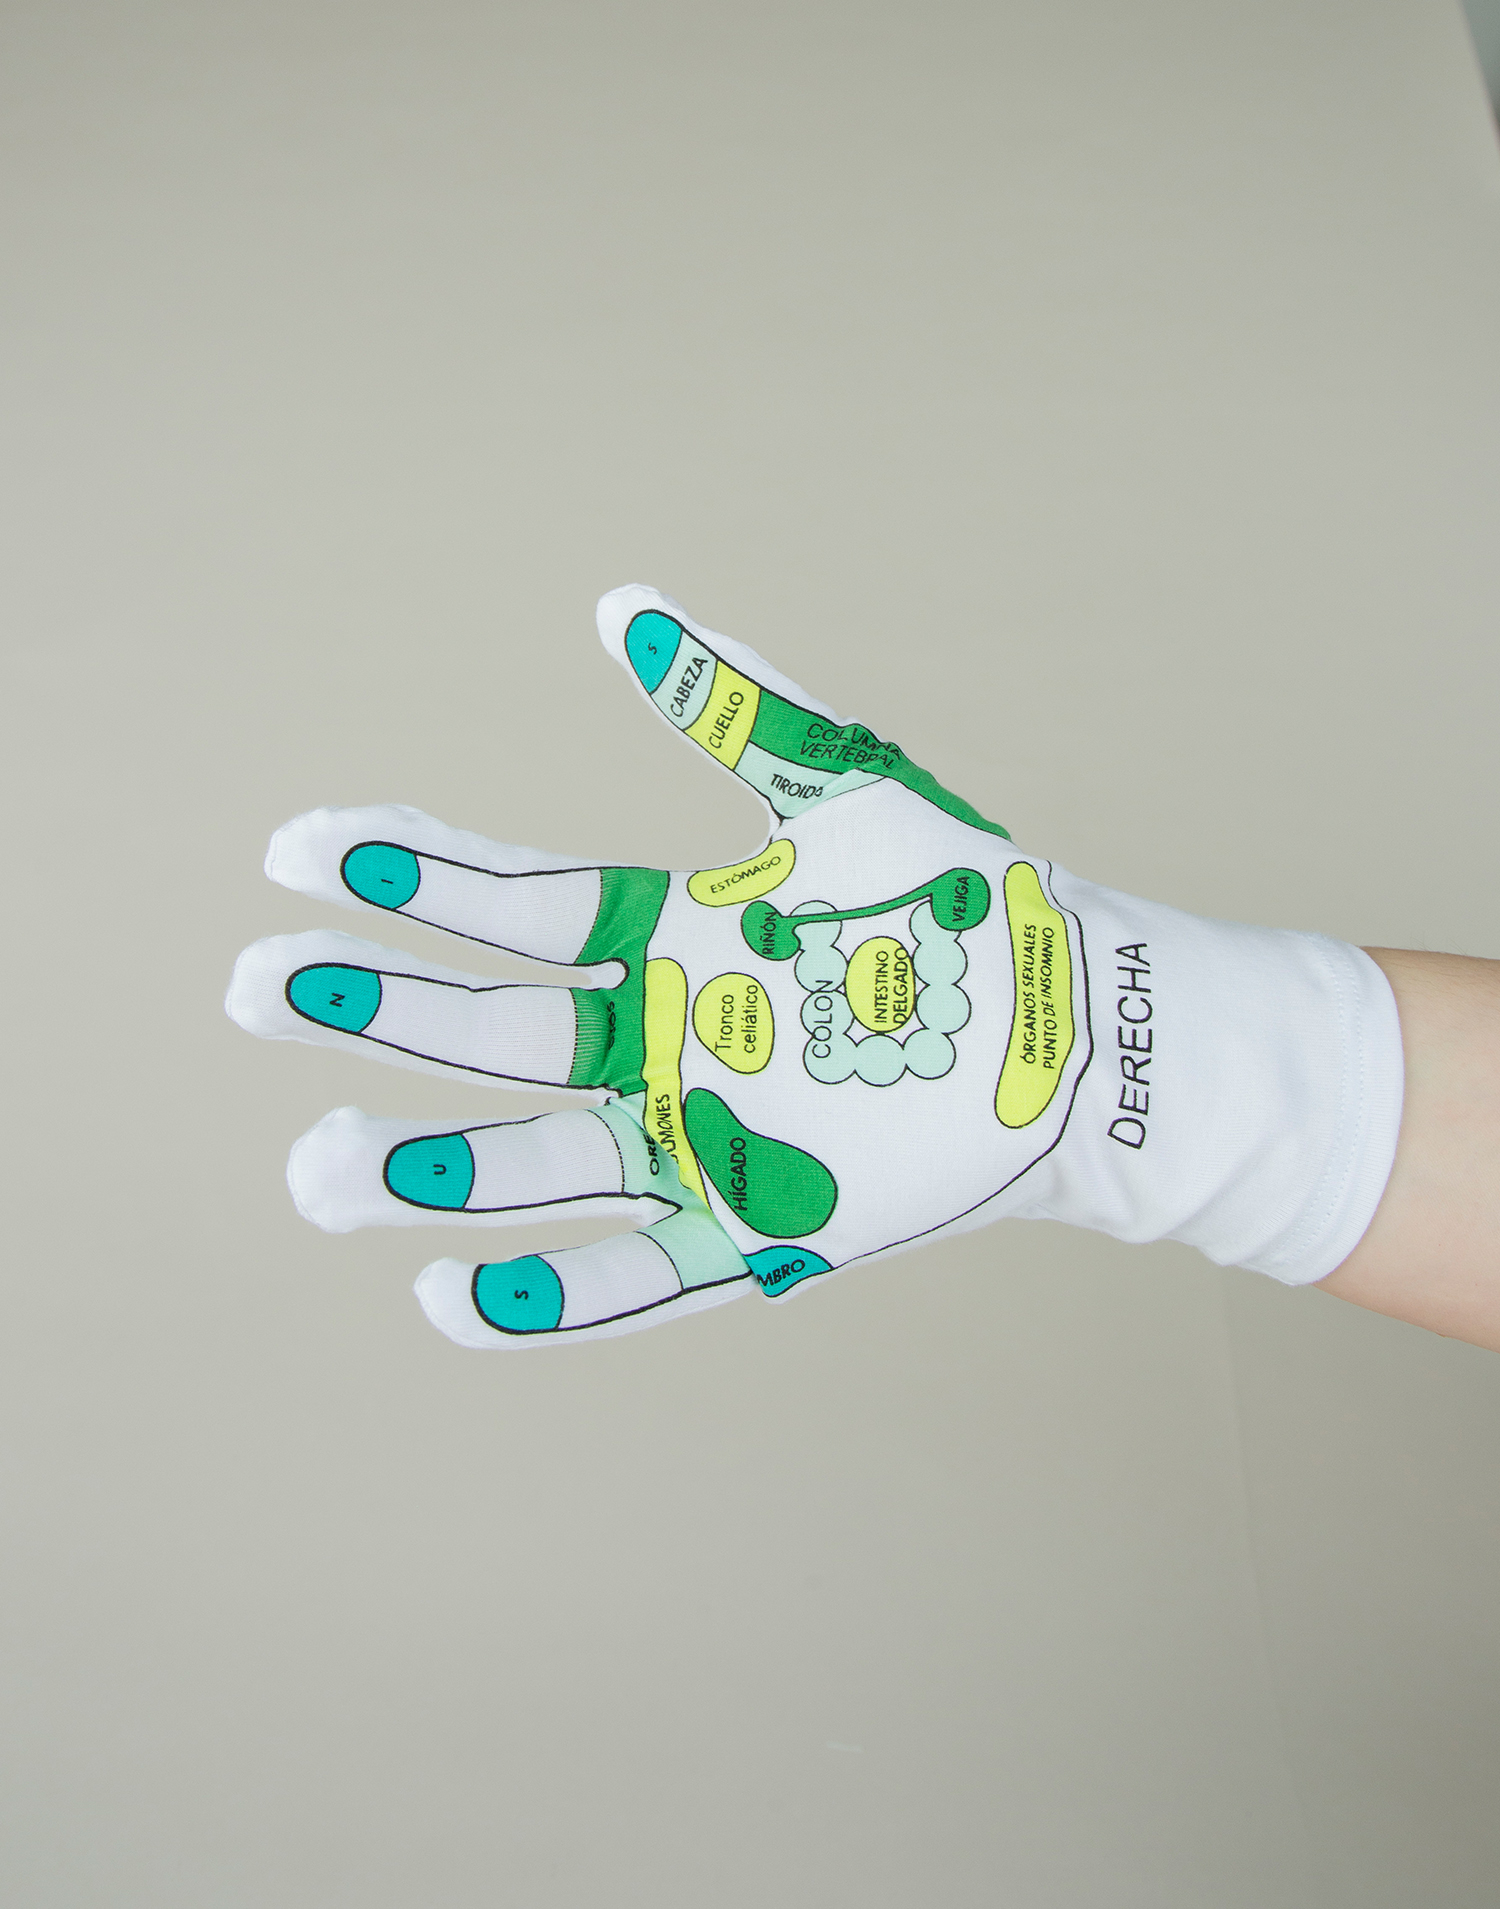 Acupuncture glove